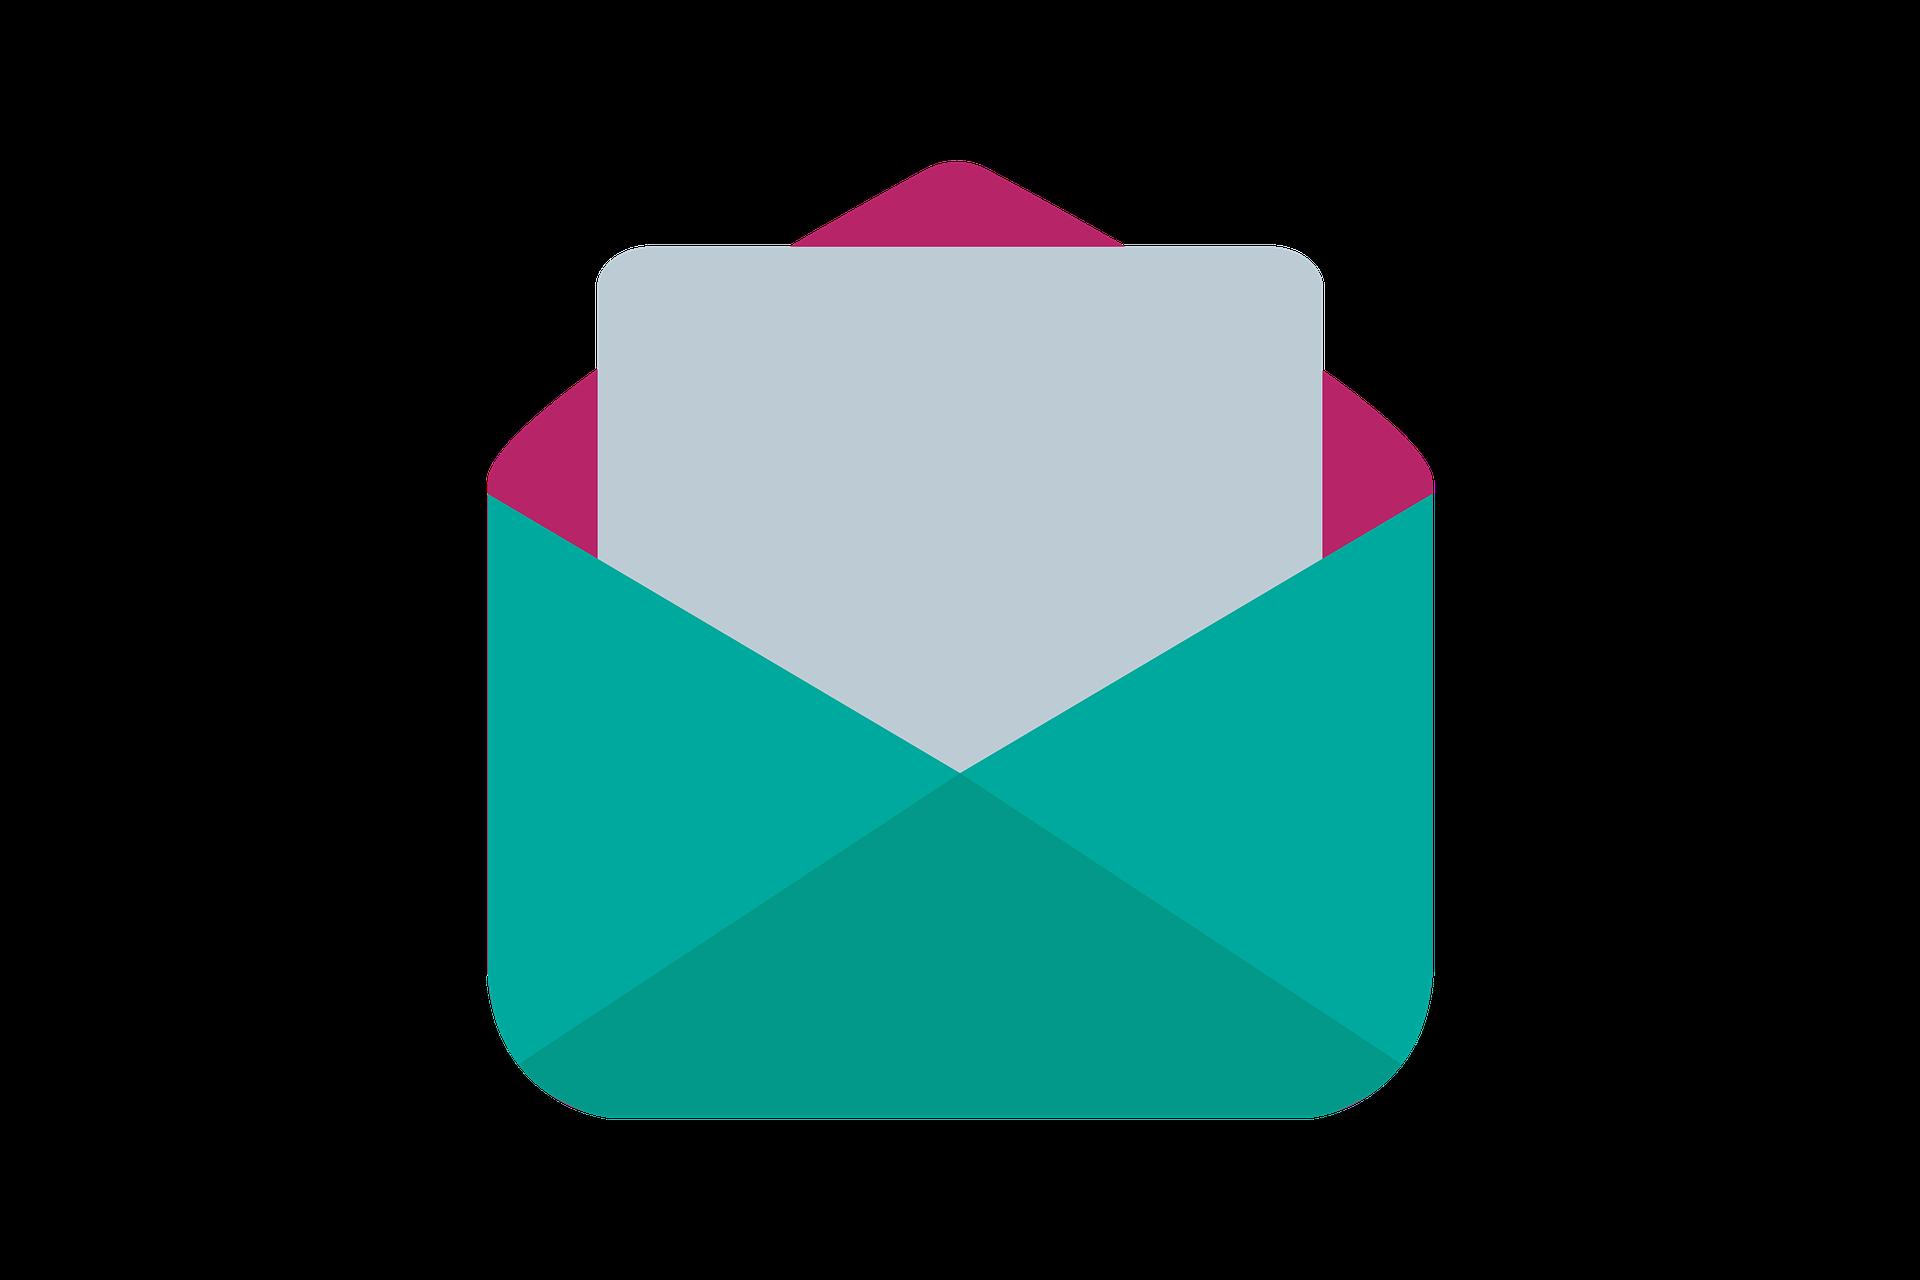 Offener Brief an die Verwaltung